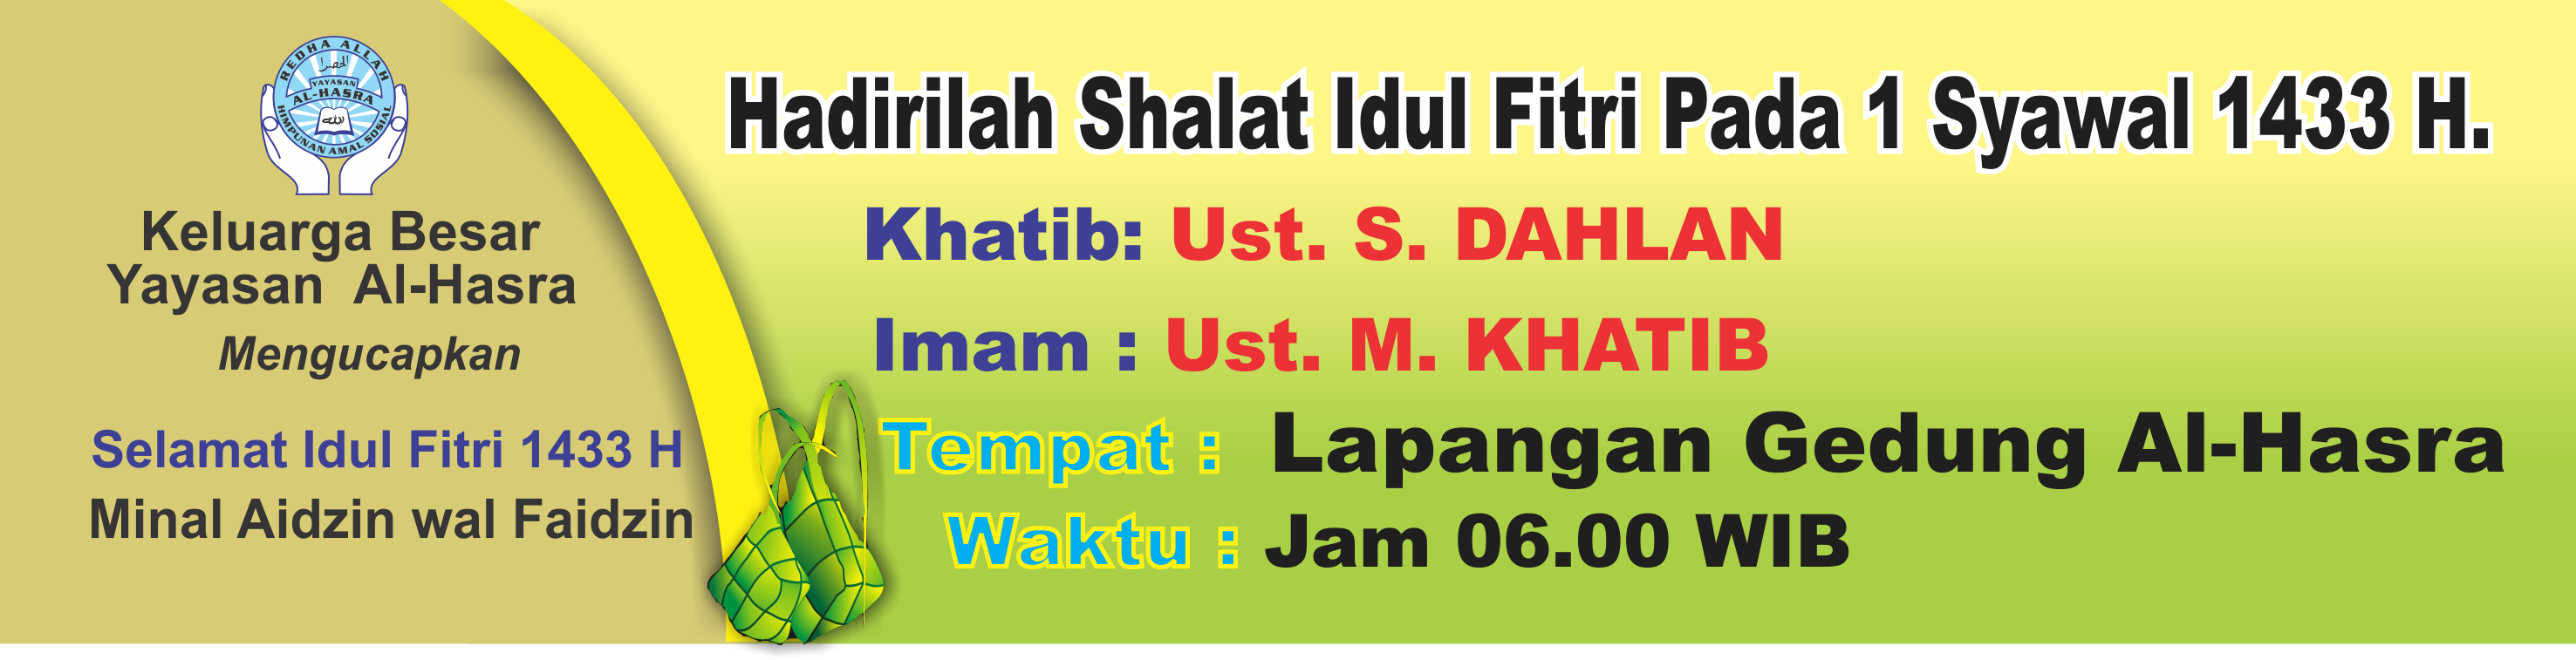 2953 x 757 · 400 kB · png, Idul Fitri H M Spanduk Darmawan Jpg